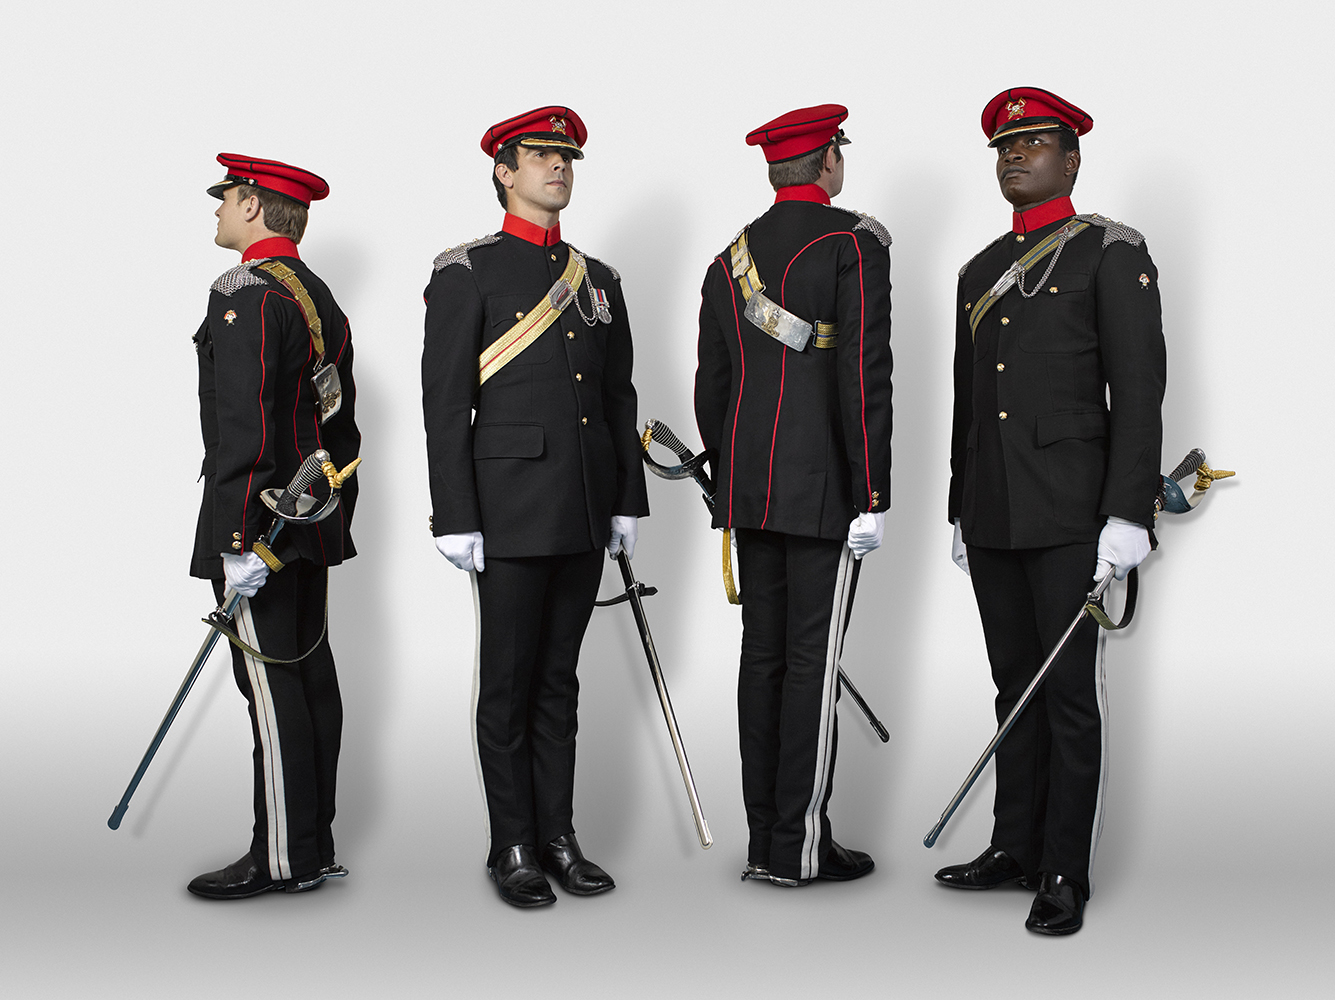 Captains, Humphreys, Prichard, White & Issac The Royal Lancers (Rory Lewis Military Portrait Photographer